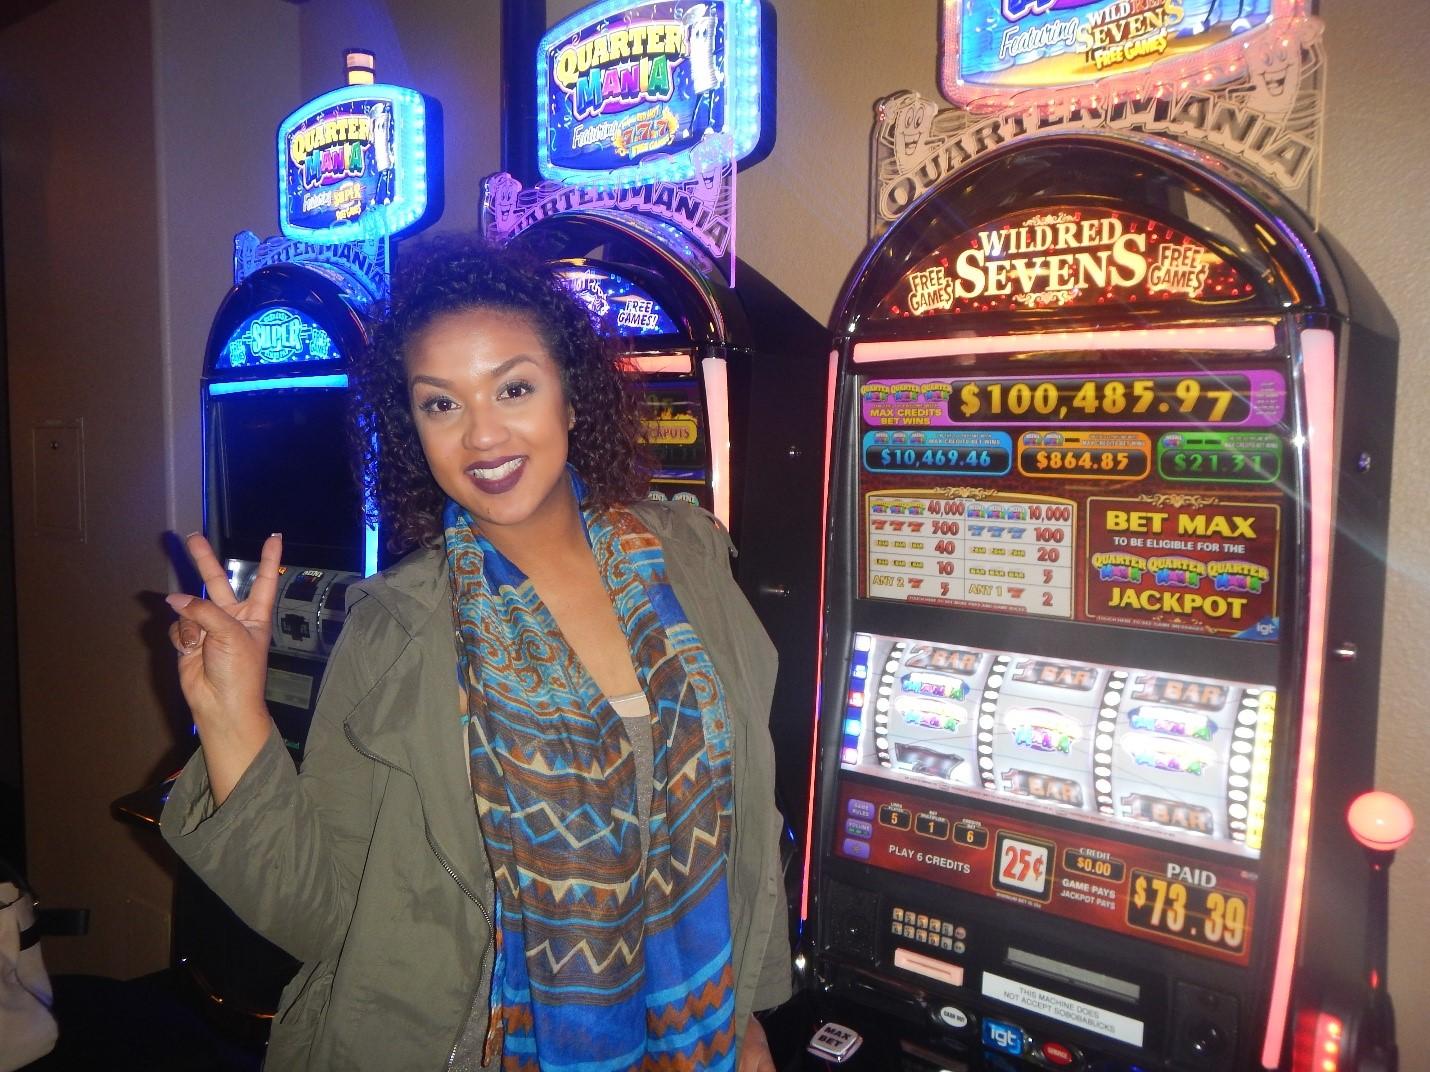 Bingocom Casino  Play online casino games and win real